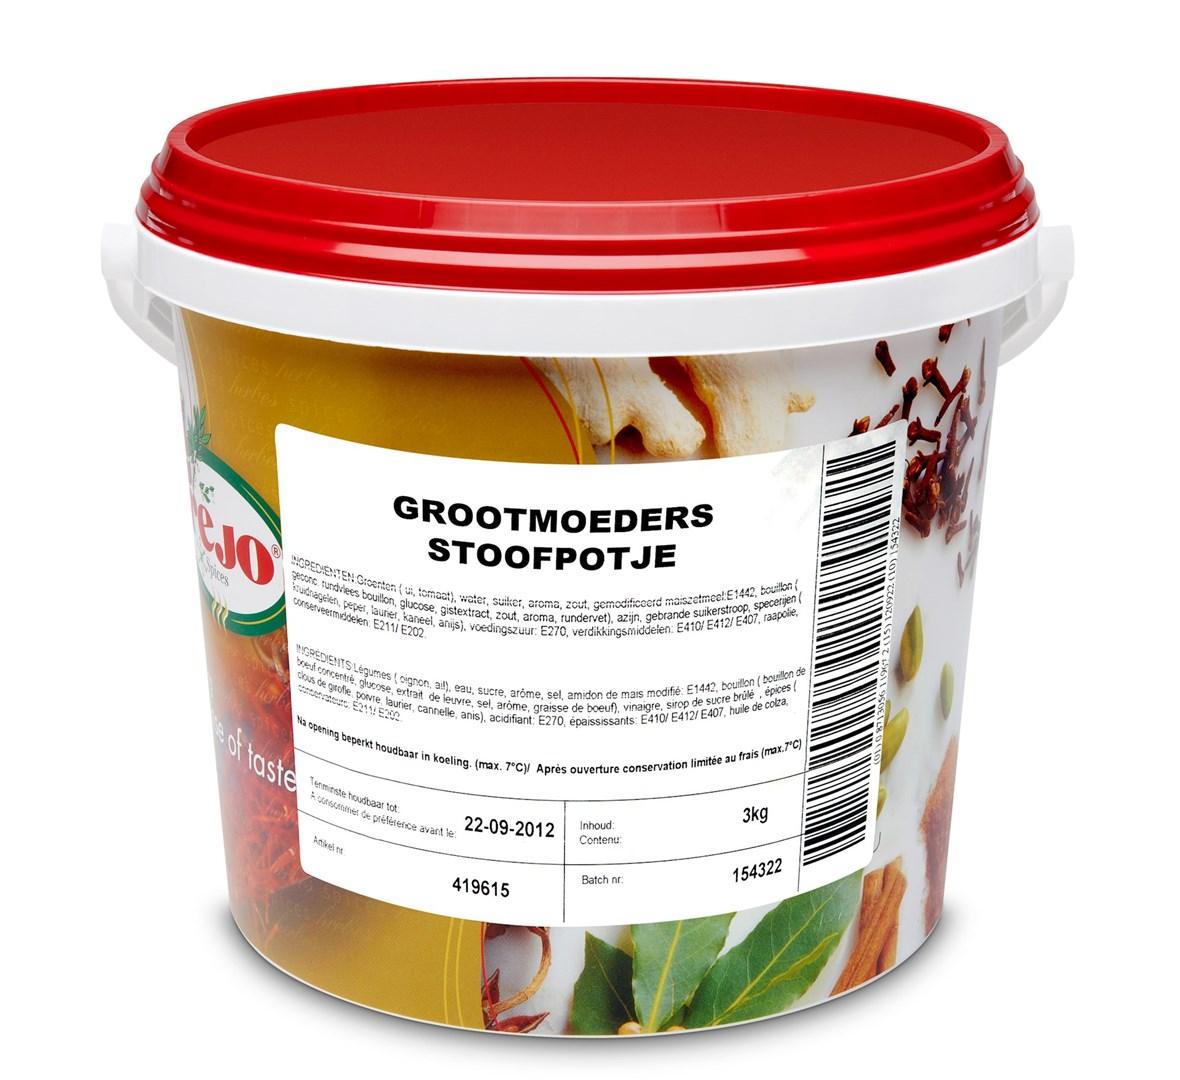 Productafbeelding Grootmoeders stoofpotje a 3kg